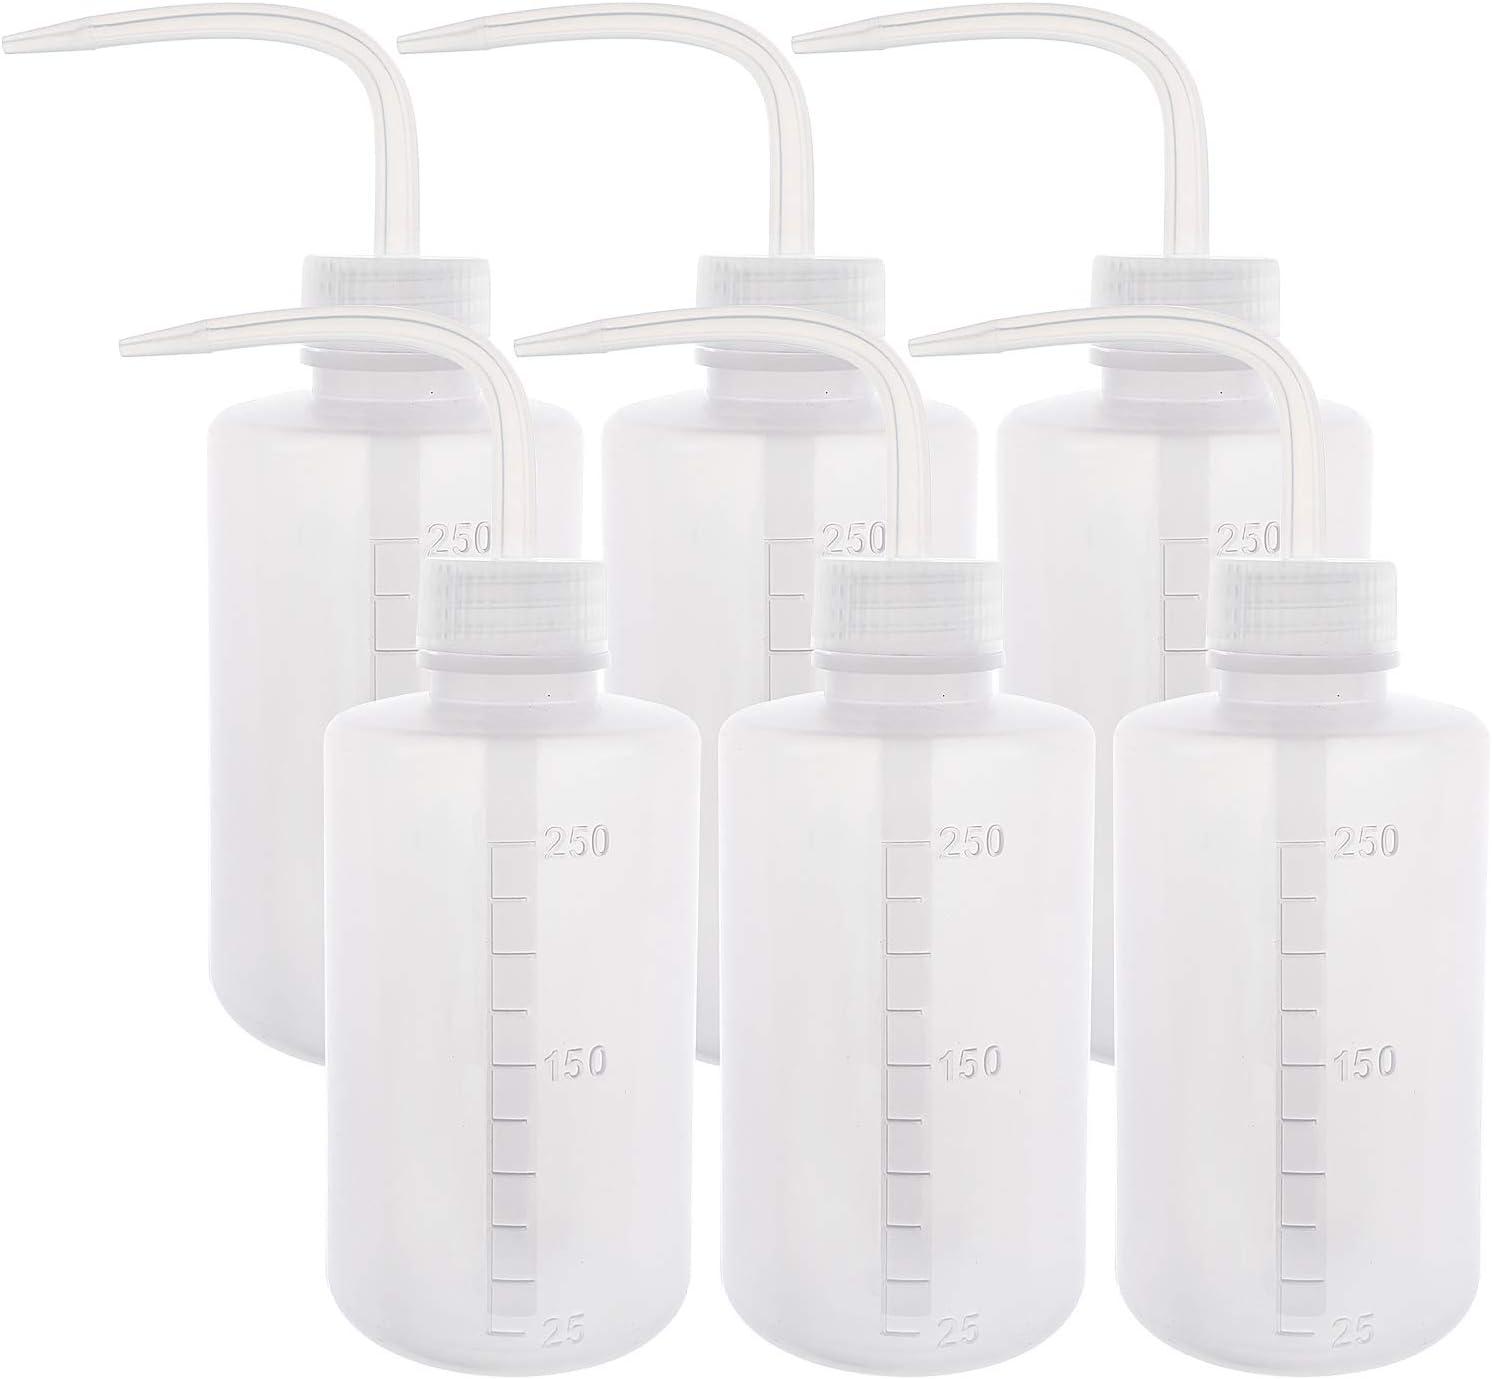 SUPERLELE 6pcs LDPE 250ml 8.5oz Safety Wash Bottle, Plastic Squeeze Bottle Squirt Bottle Medical Label Tattoo Wash Bottle